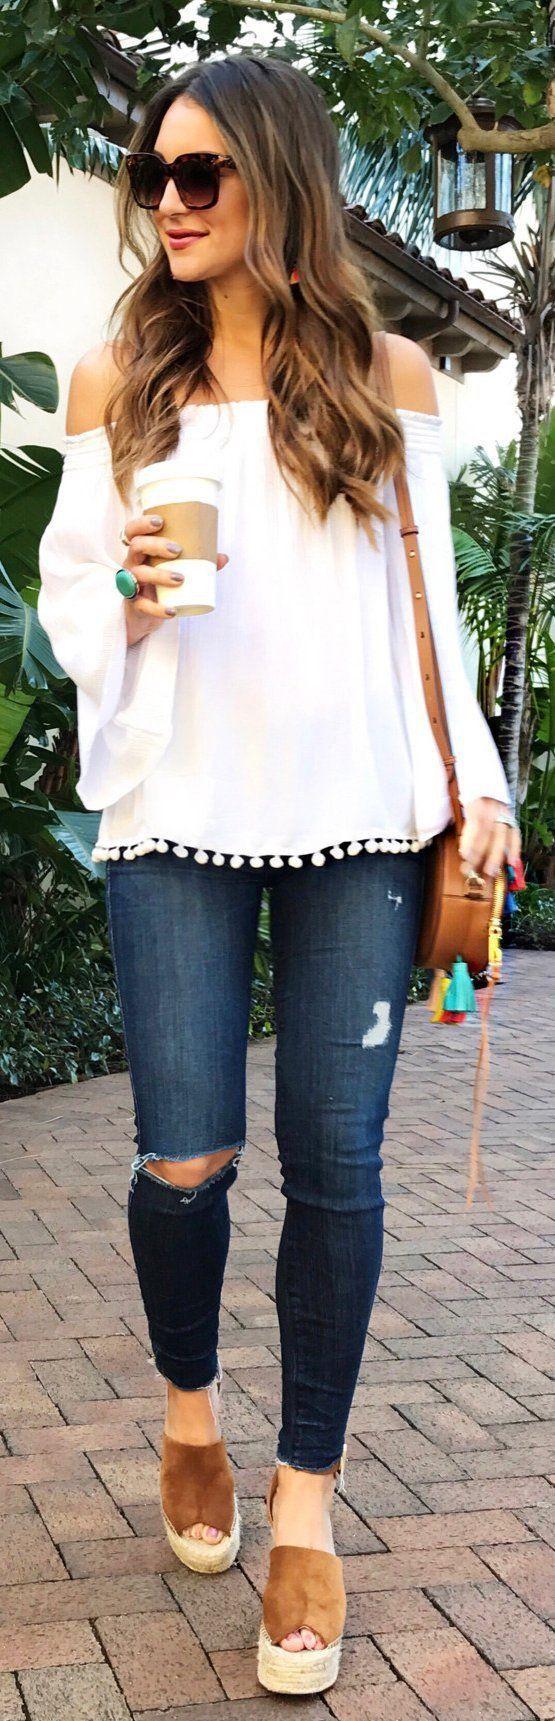 Outfits con jeans y blusas blancas shoulder latest summer fashion